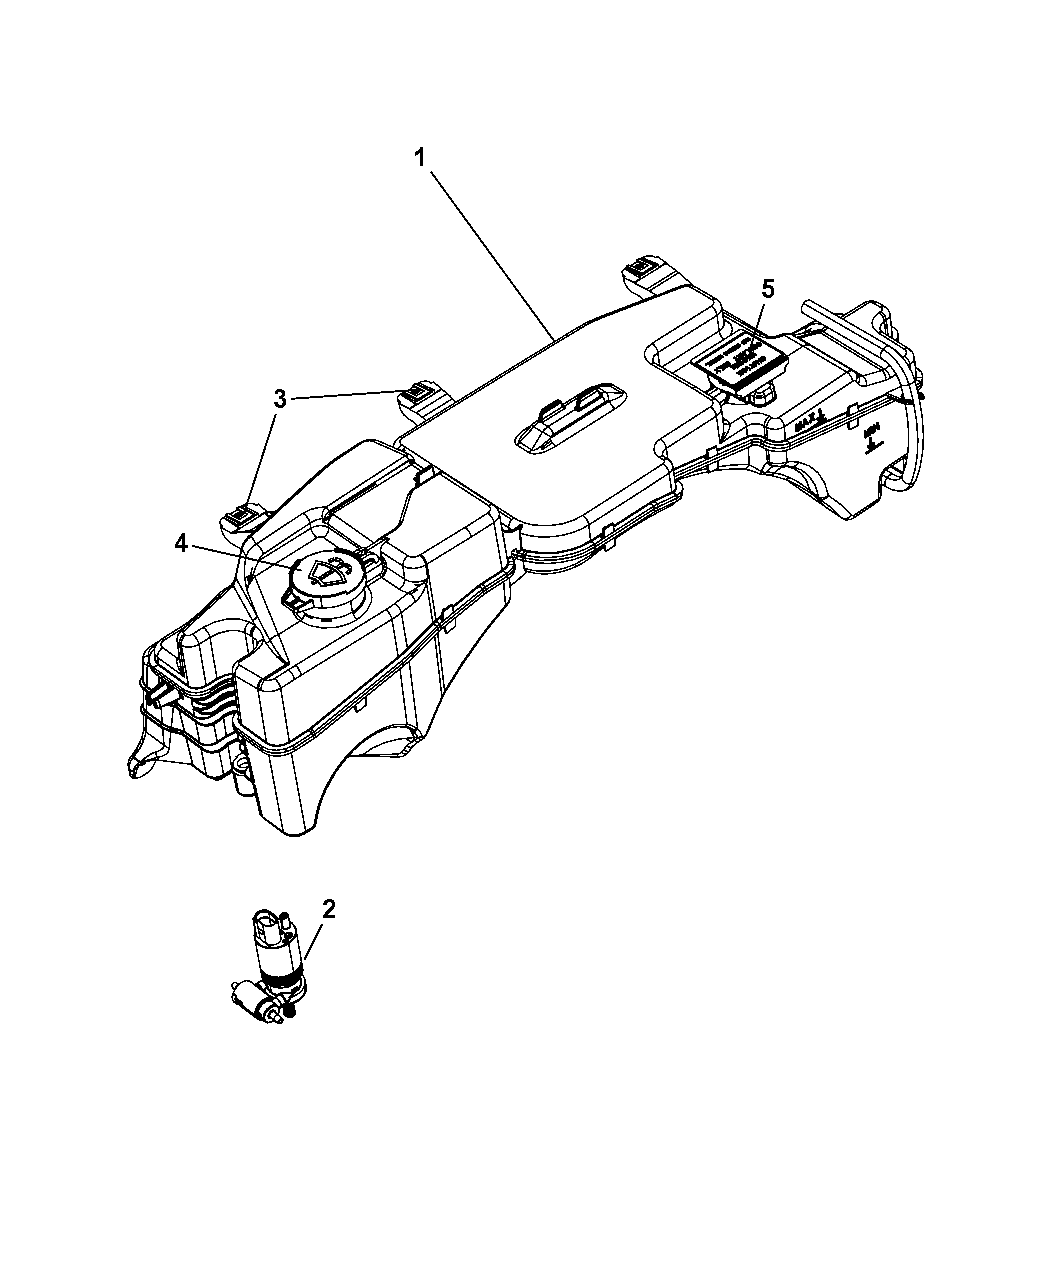 2007 Dodge Nitro Coolant Tank